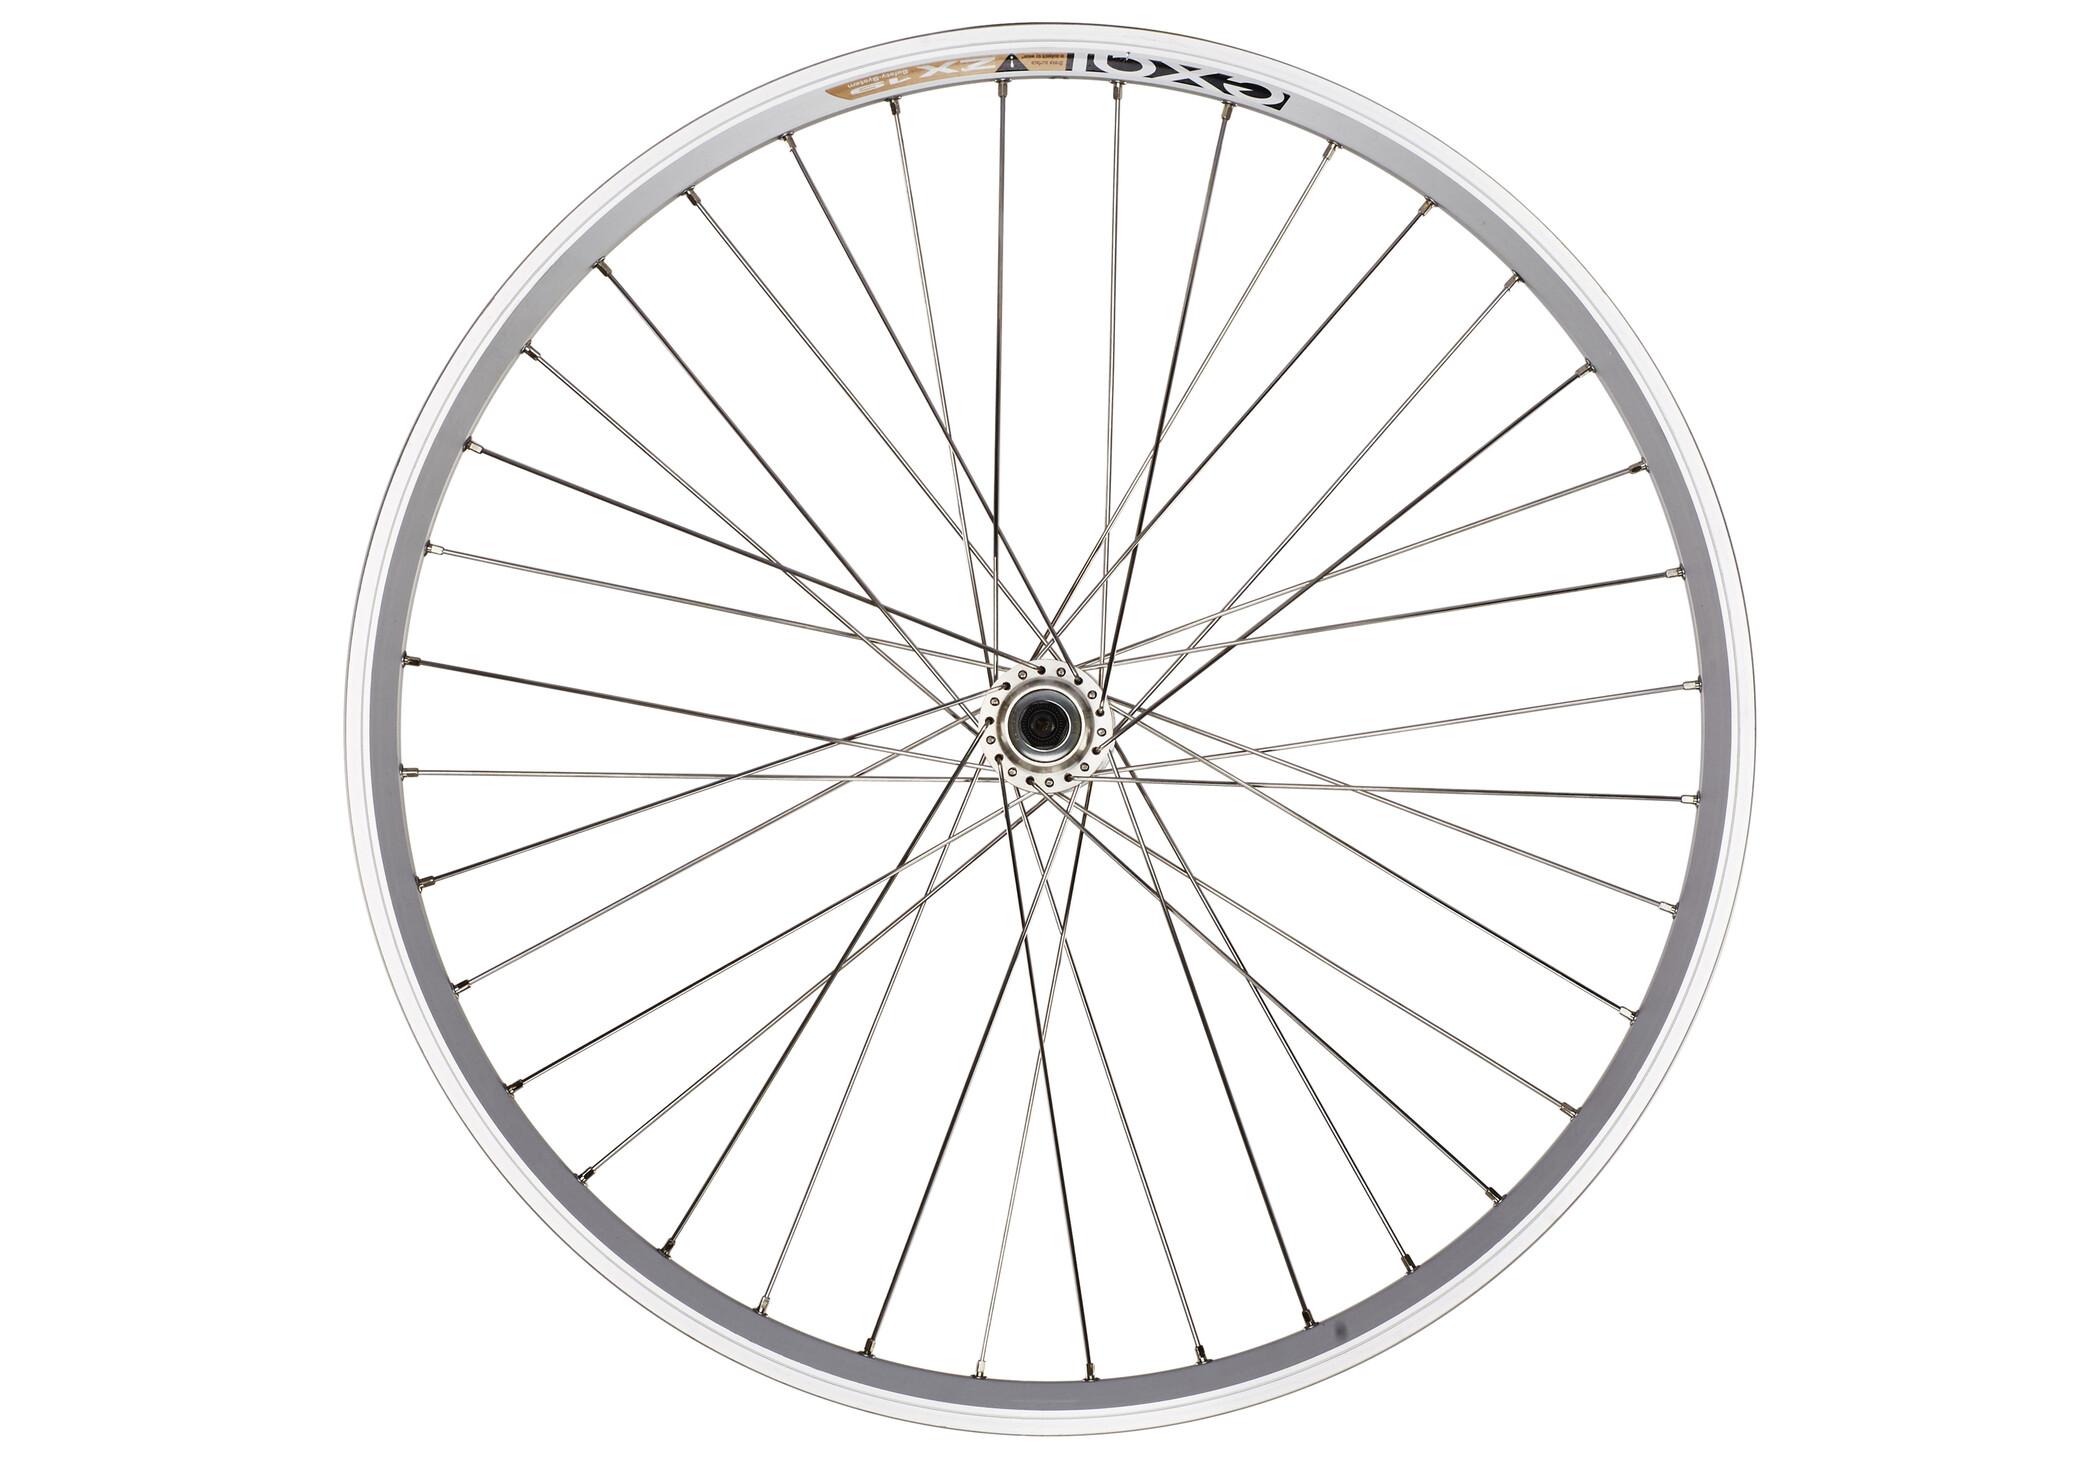 Exal ZX 19 H Bike 26 x 1.75 28 x 1.75, RM-40, 7-trins Quick release, 36h, silver | Wheelset